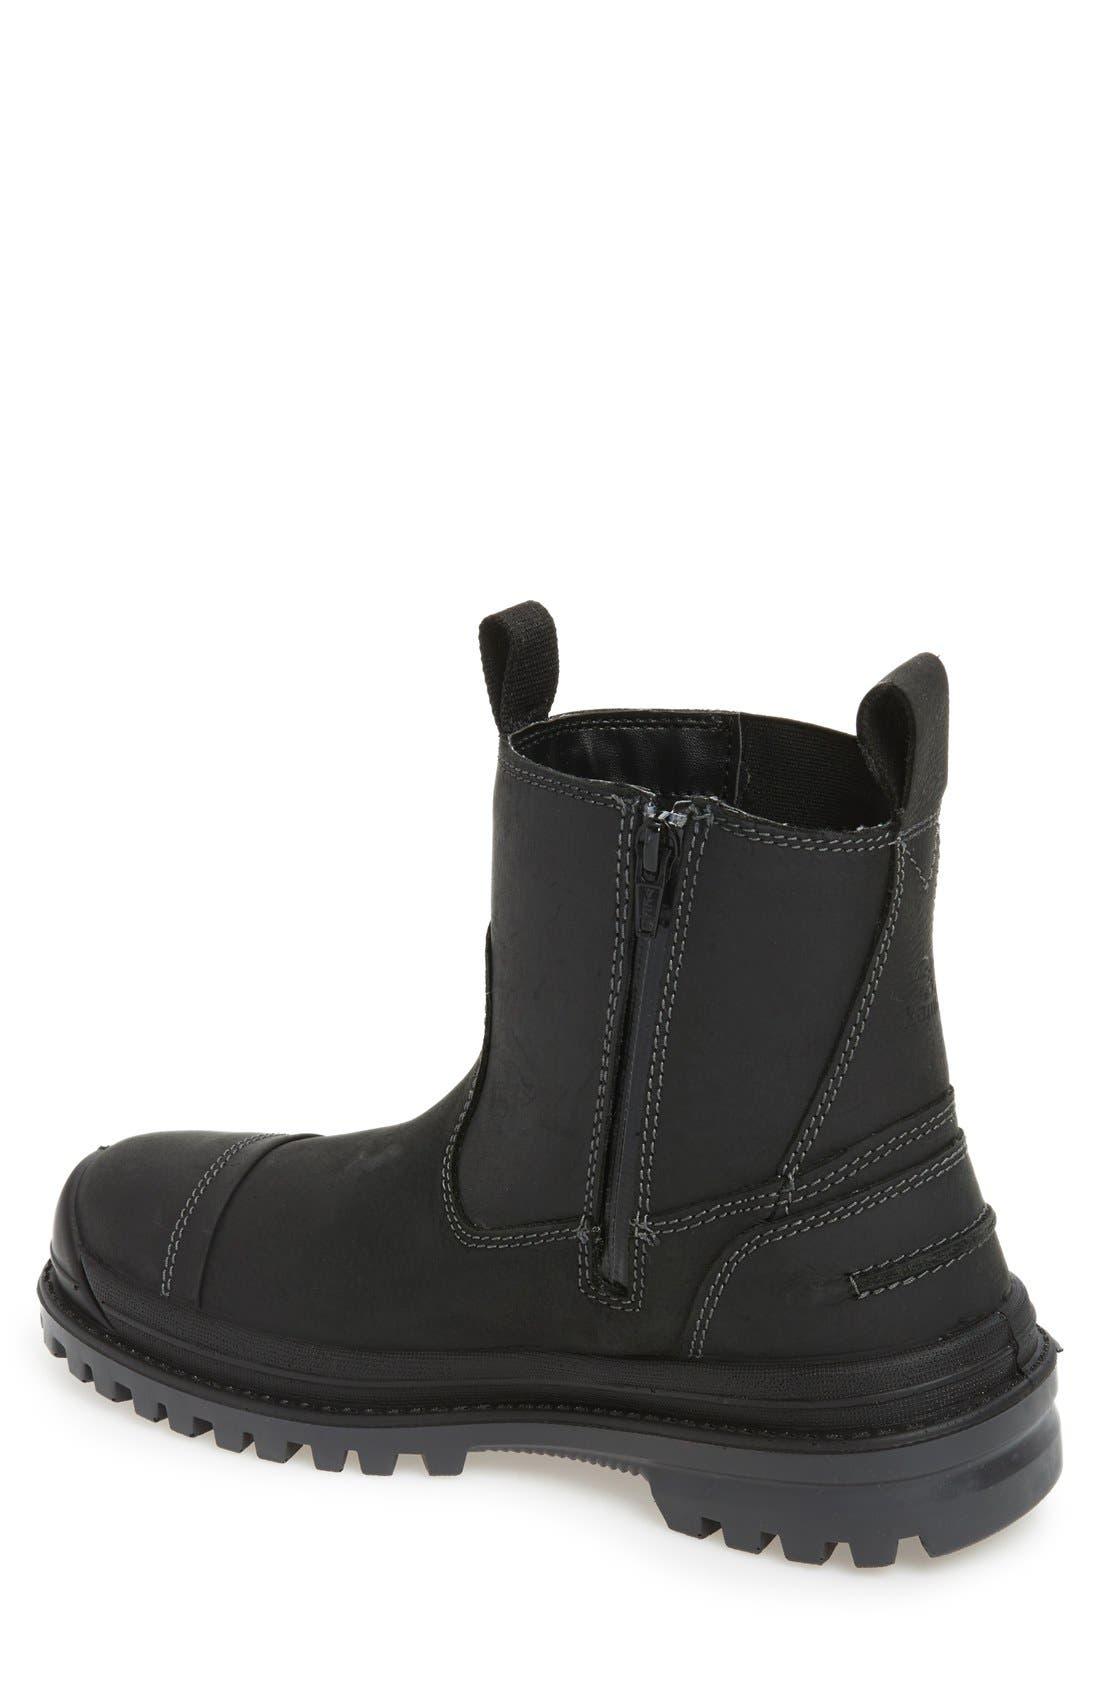 Griffon Snow Boot,                             Alternate thumbnail 2, color,                             Black Leather